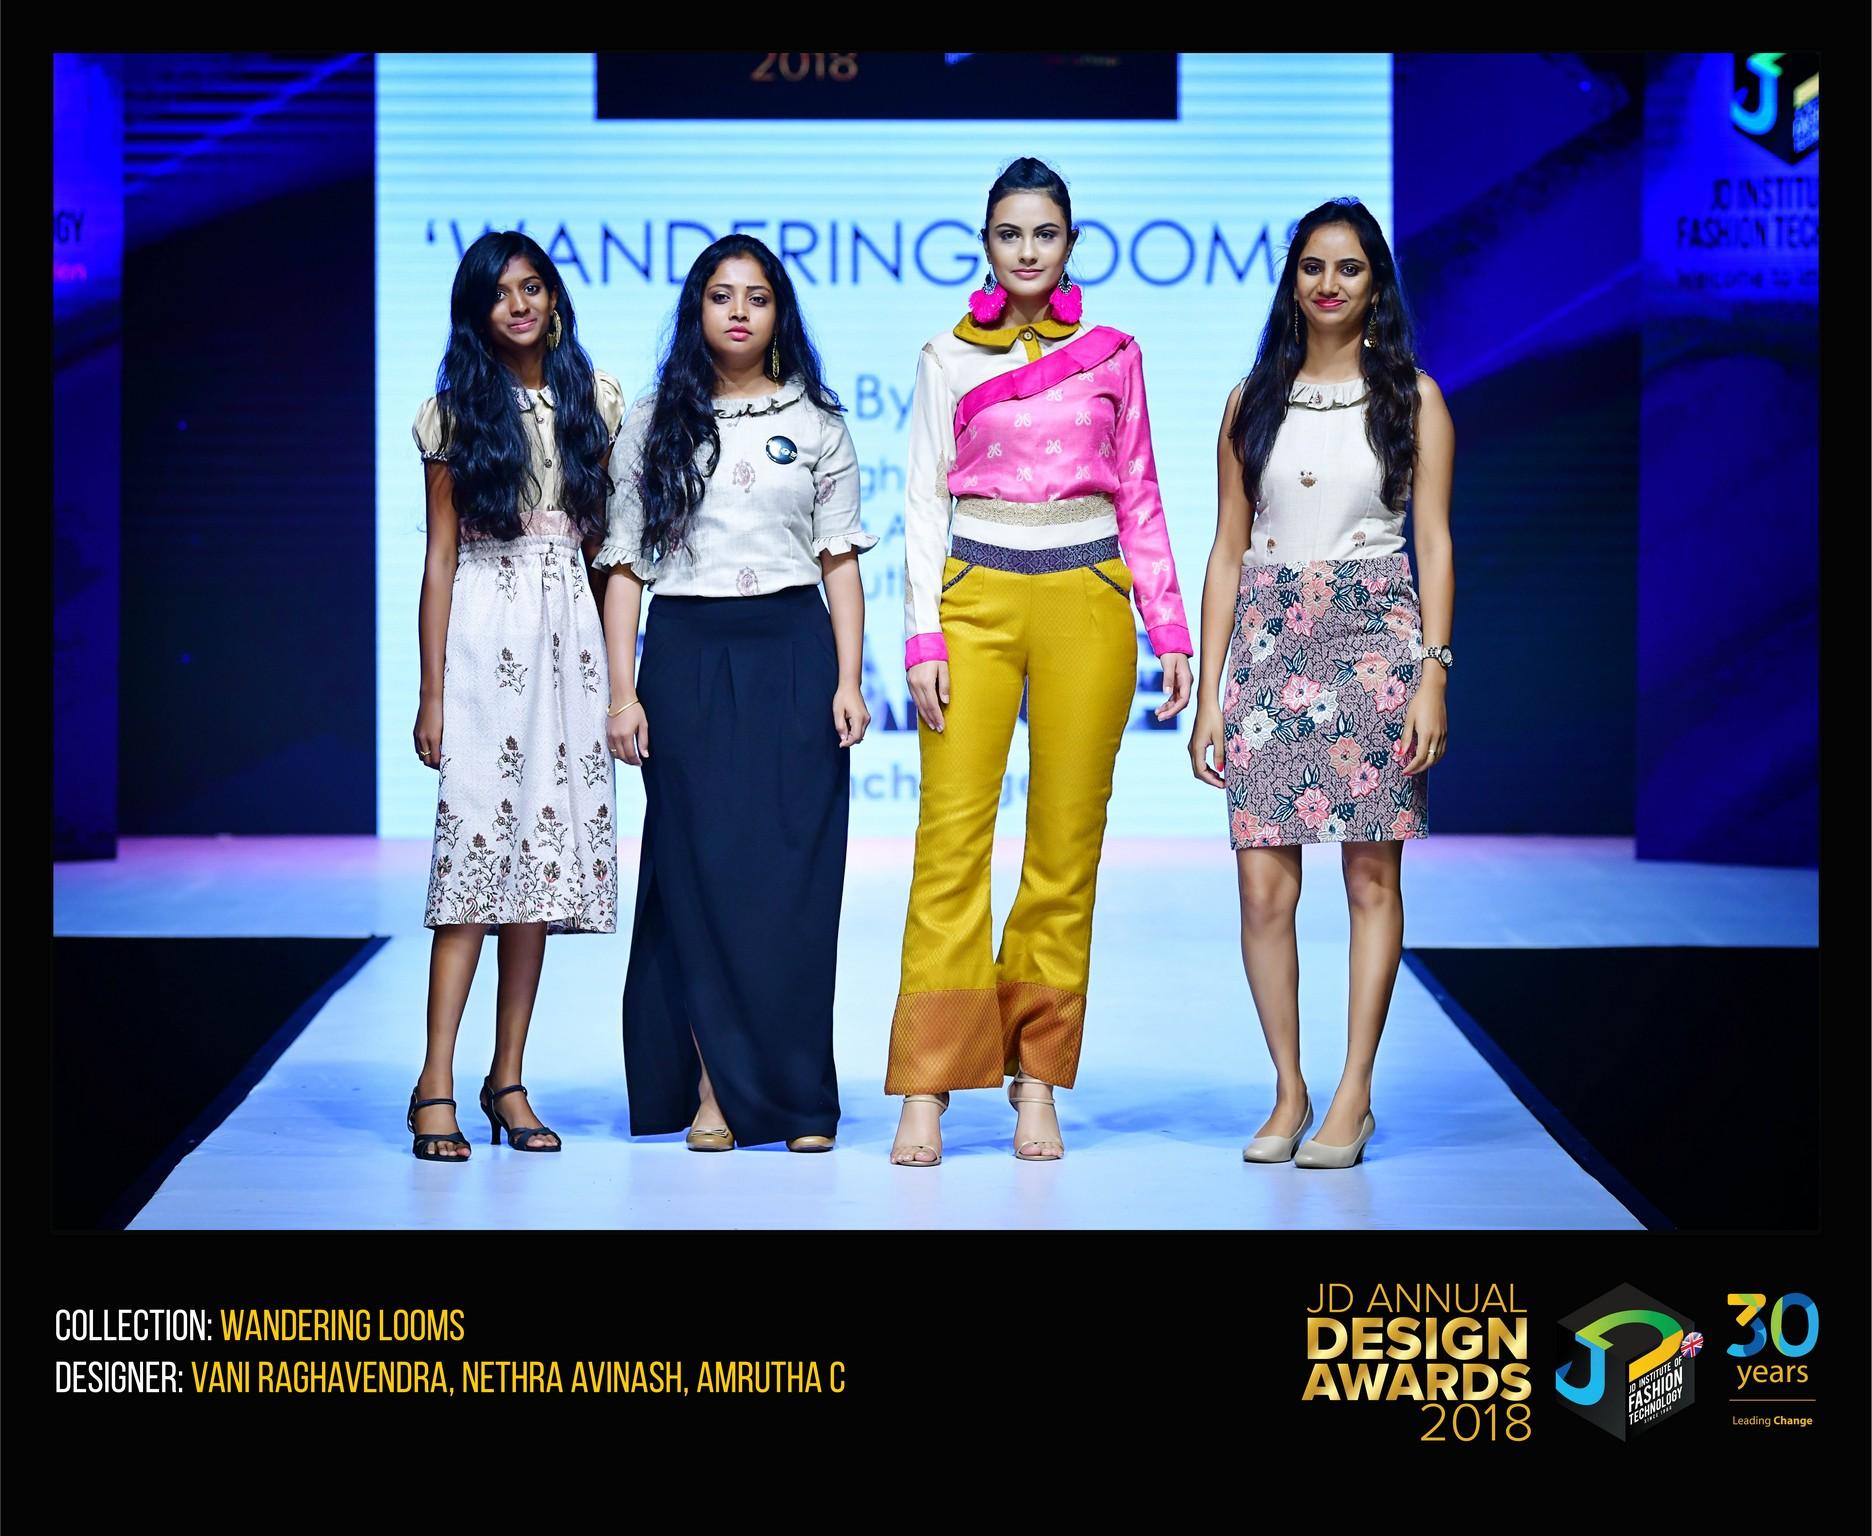 Wandering Looms – Change – JD Annual Design Awards 2018 | Designer: Vani, Amrutha and Nethra | Photography : Jerin Nath (@jerin_nath) wandering looms - WANDERING 8 - Wandering Looms – Change – JD Annual Design Awards 2018